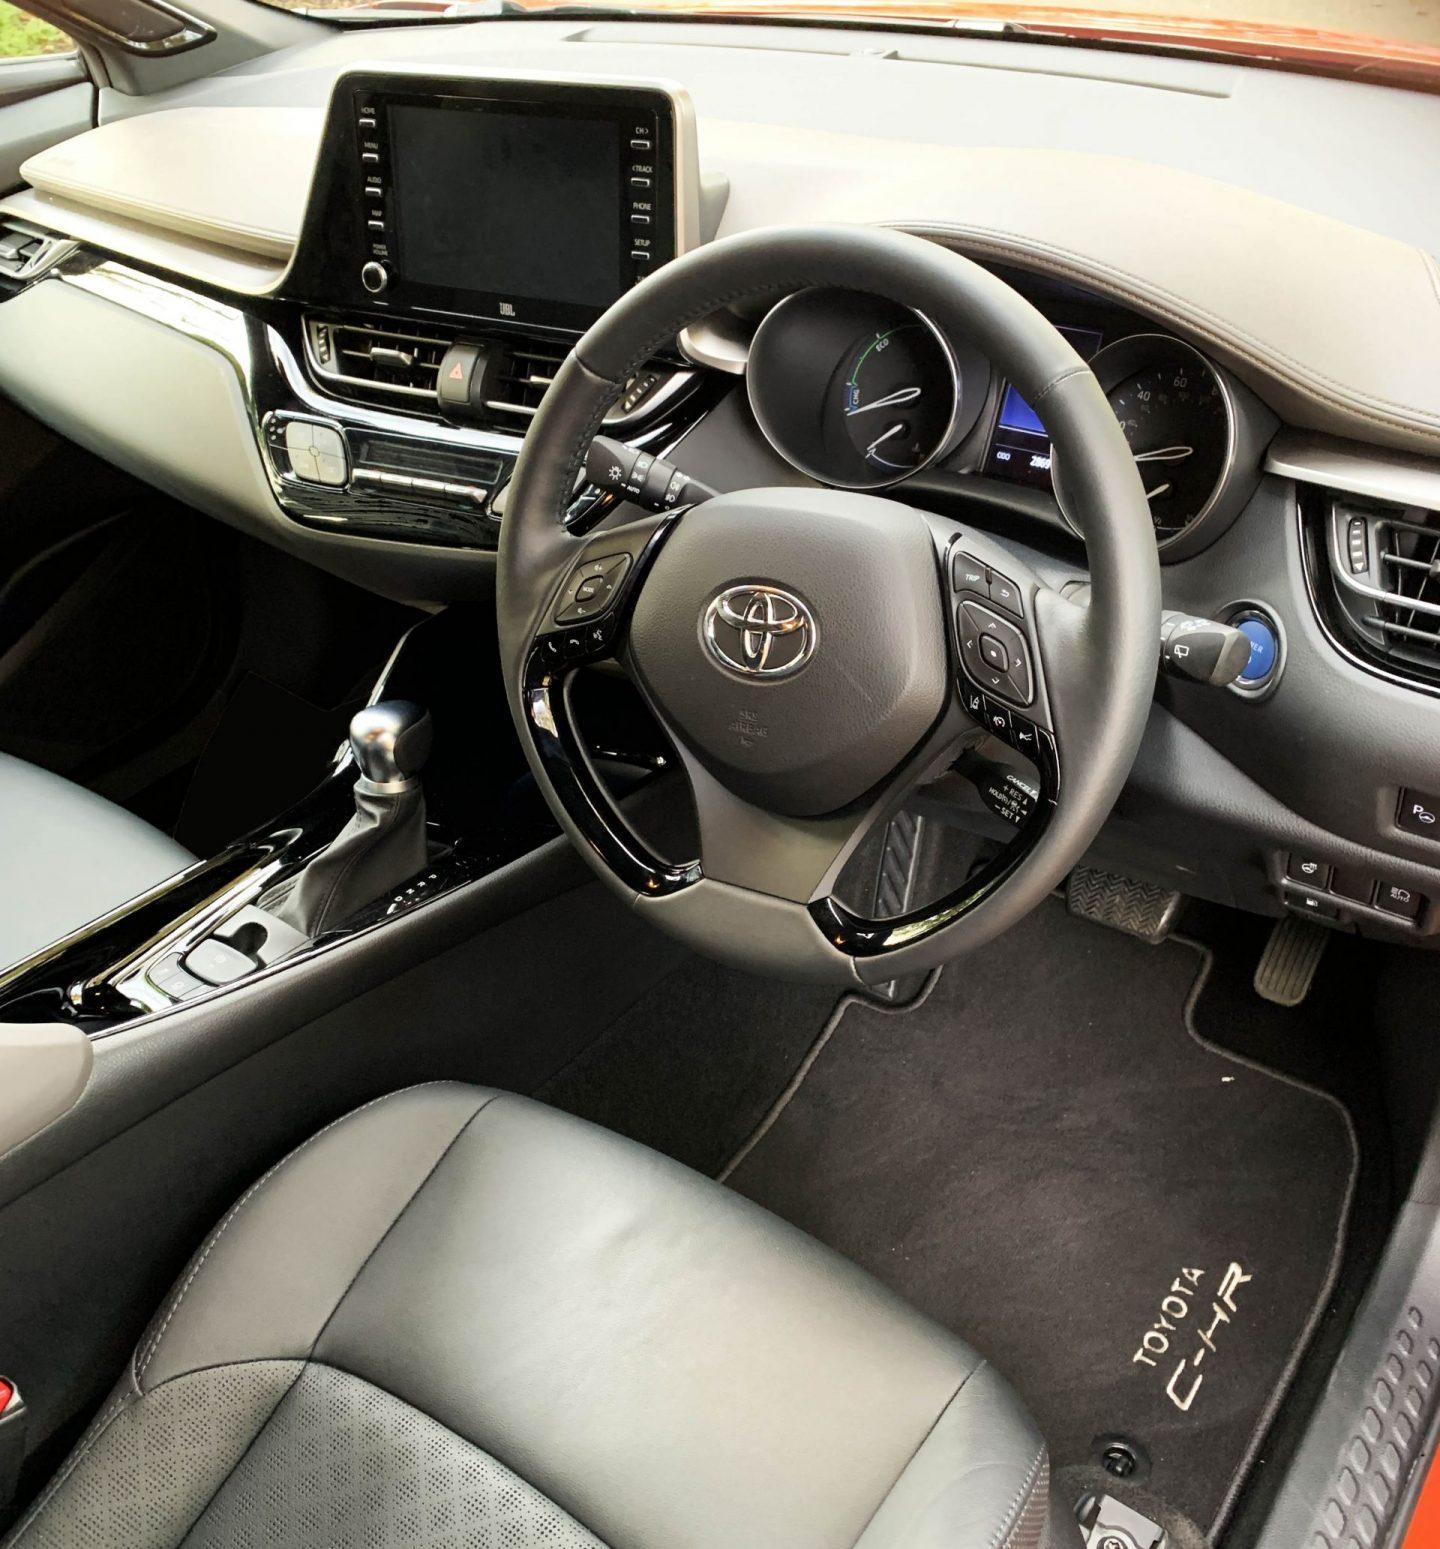 Toyota C-HR interior, Toyota C-HR Orange Edition, UK dad blog, dad blog